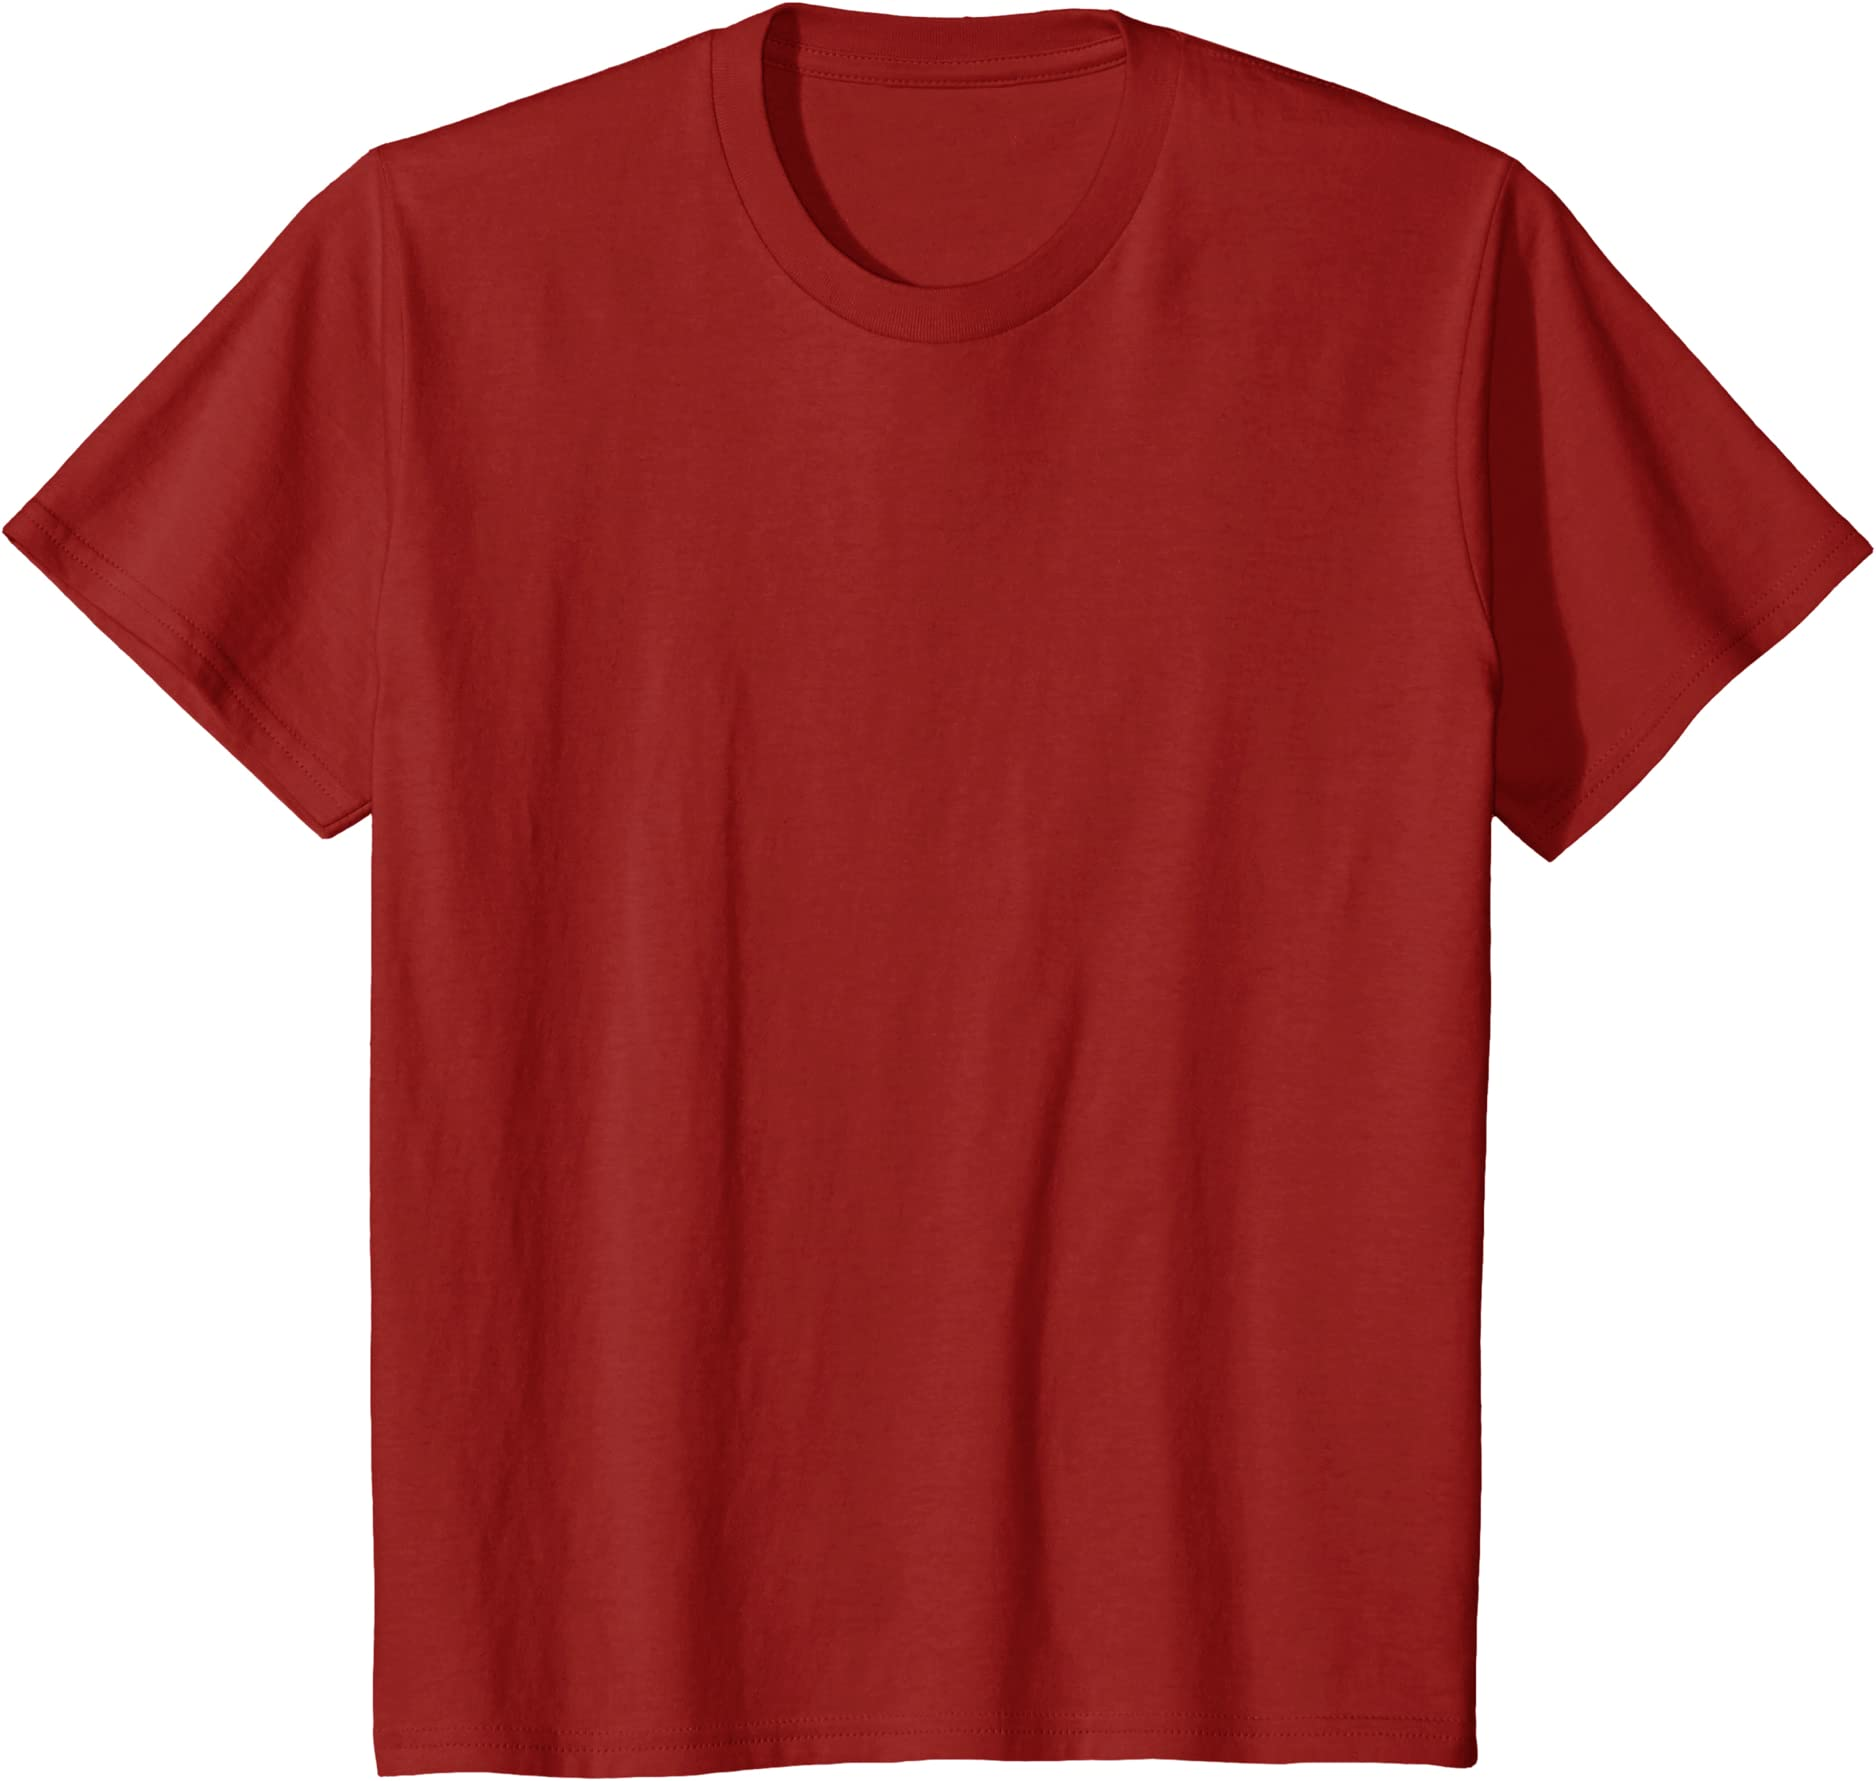 Cinnabon Fast Food Restaurant Distressed Look T Shirt